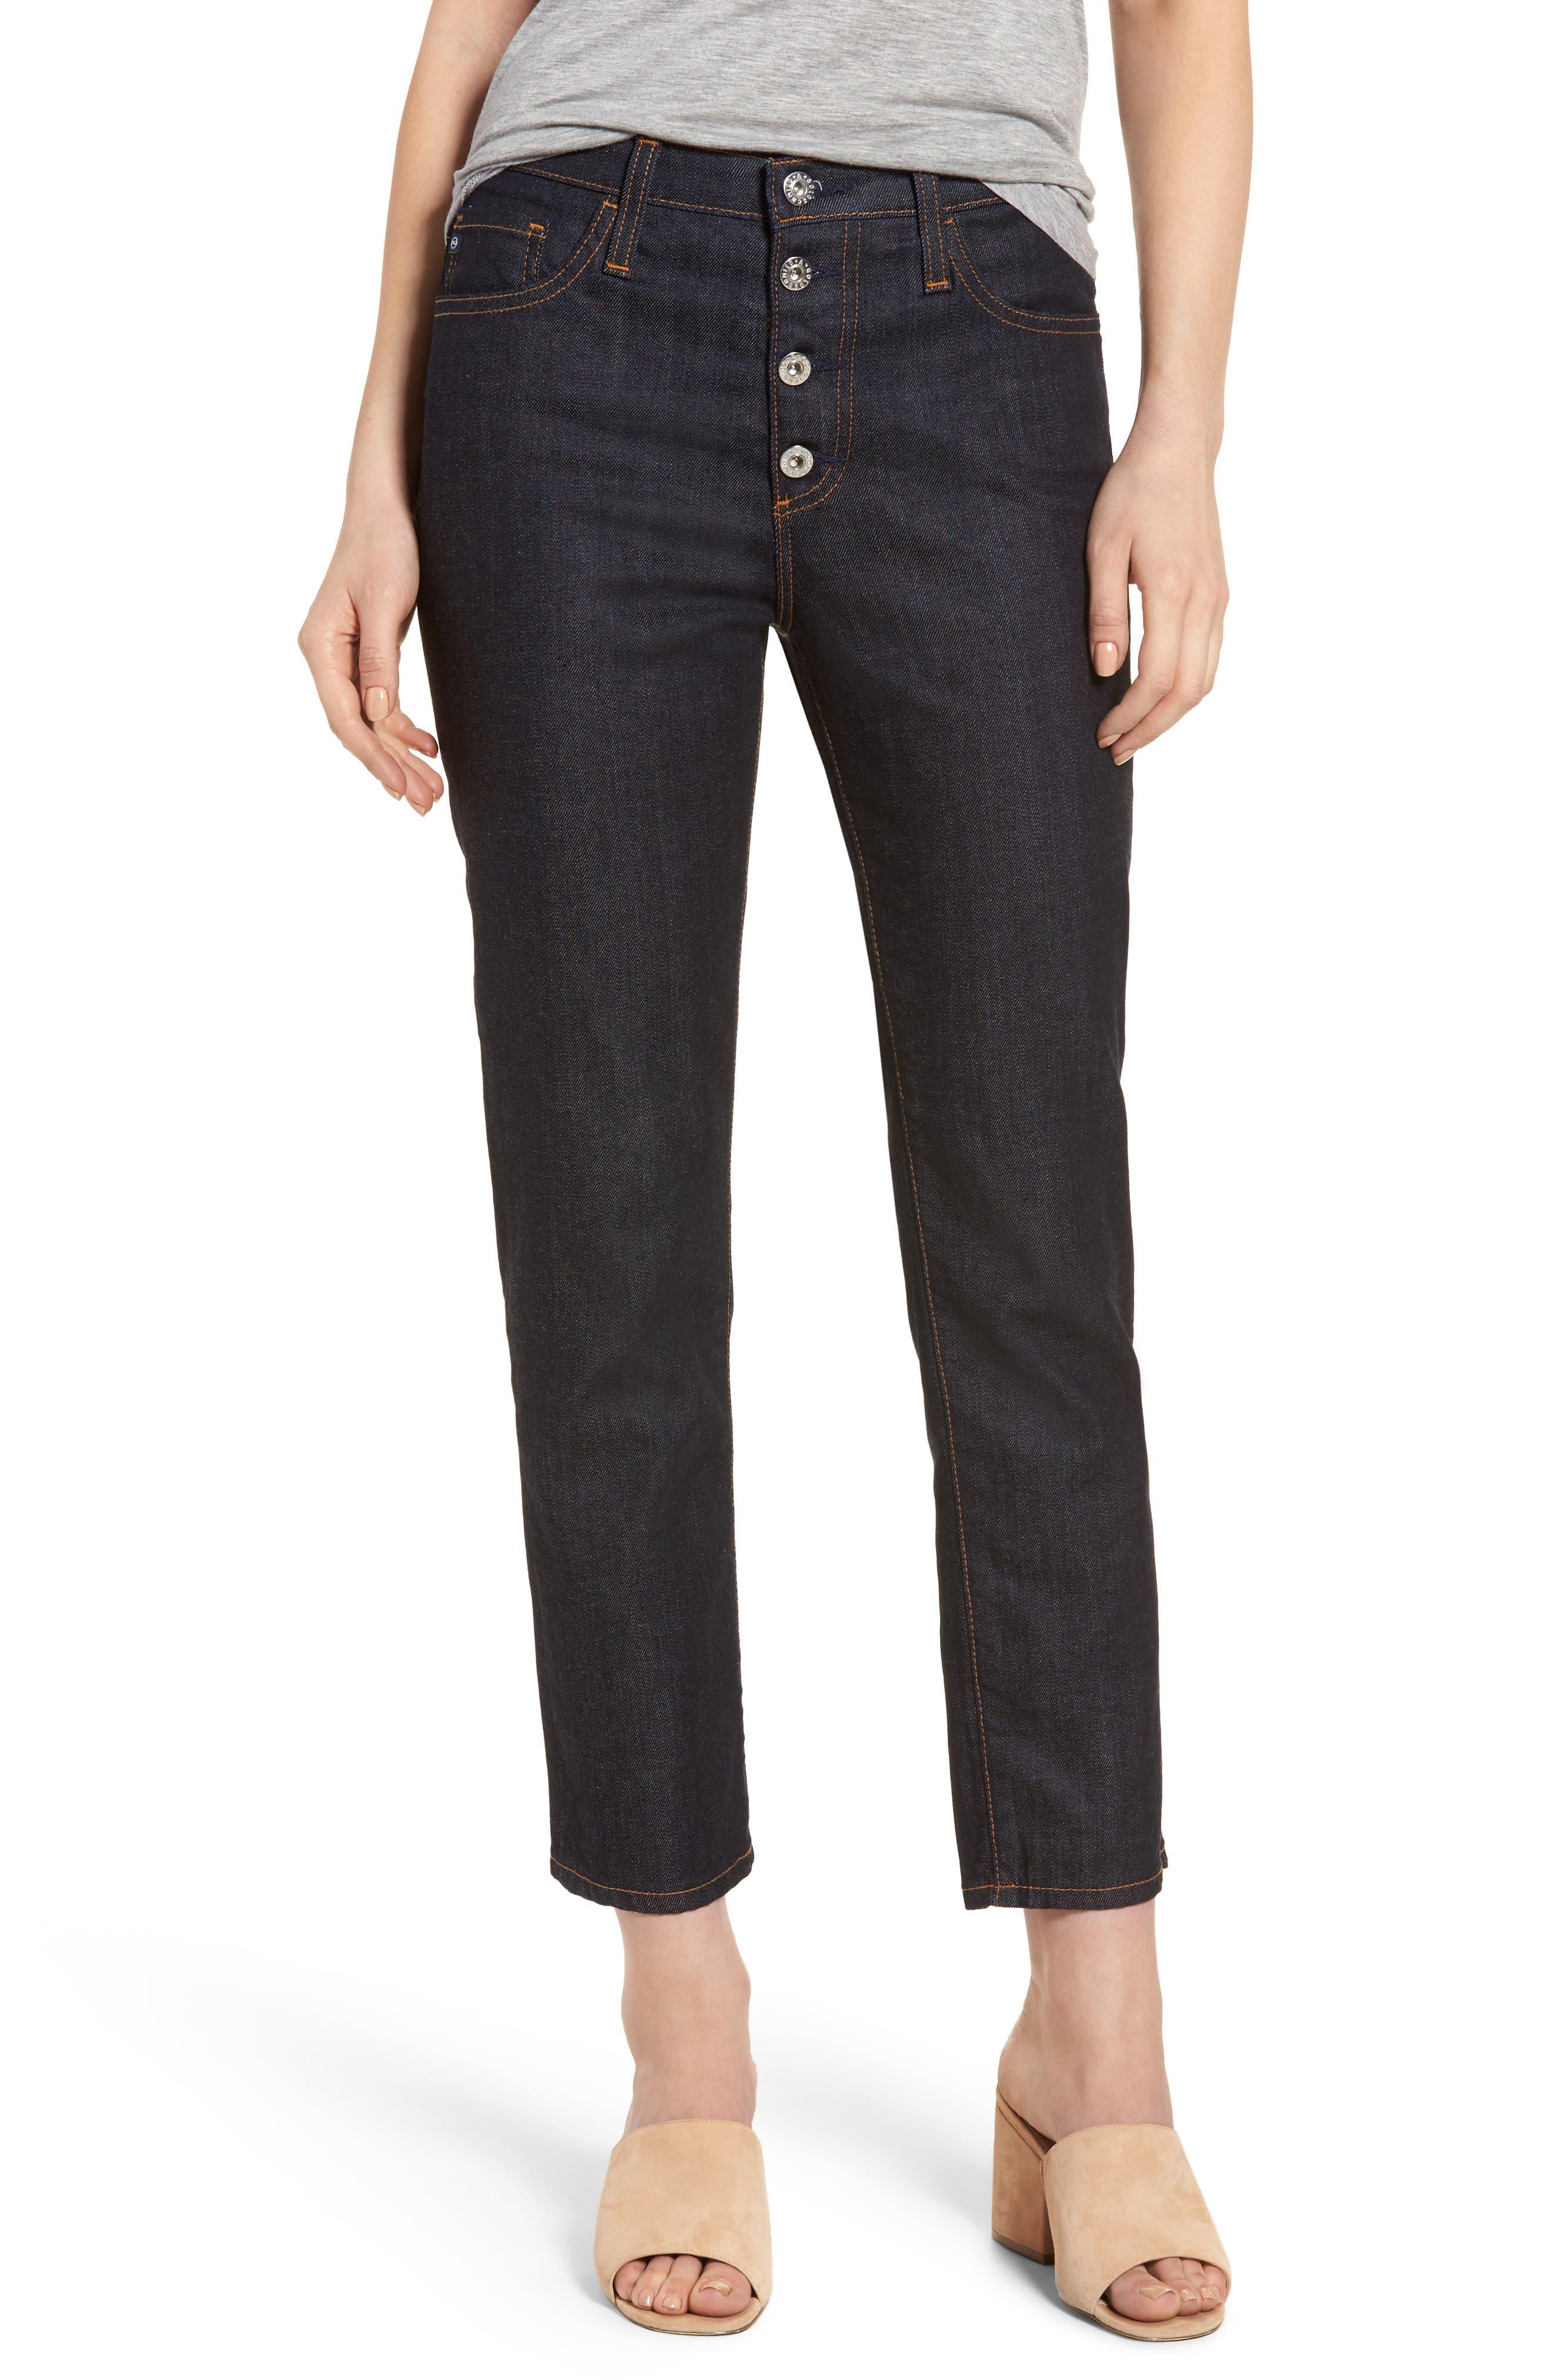 Alternate Image 1 Selected - AG Isabelle High Waist Ankle Jeans (Indigo Autumn)